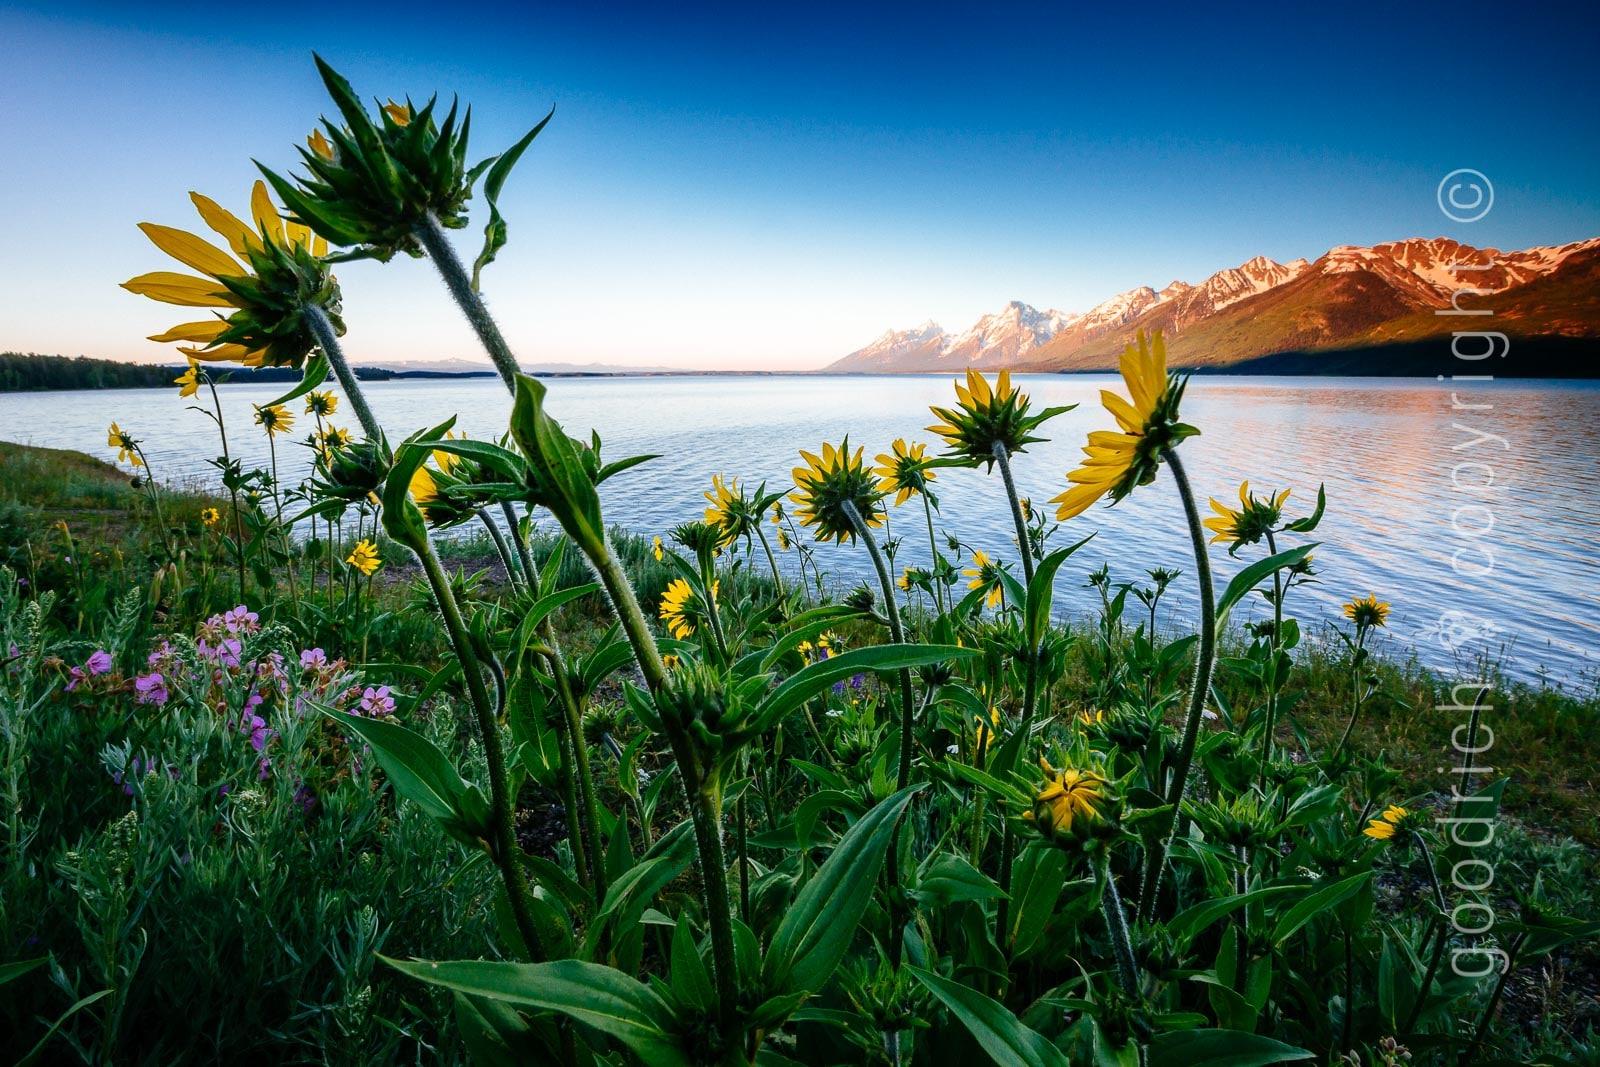 Photo Manipulation - Teton Landscape by Jay Goodrich